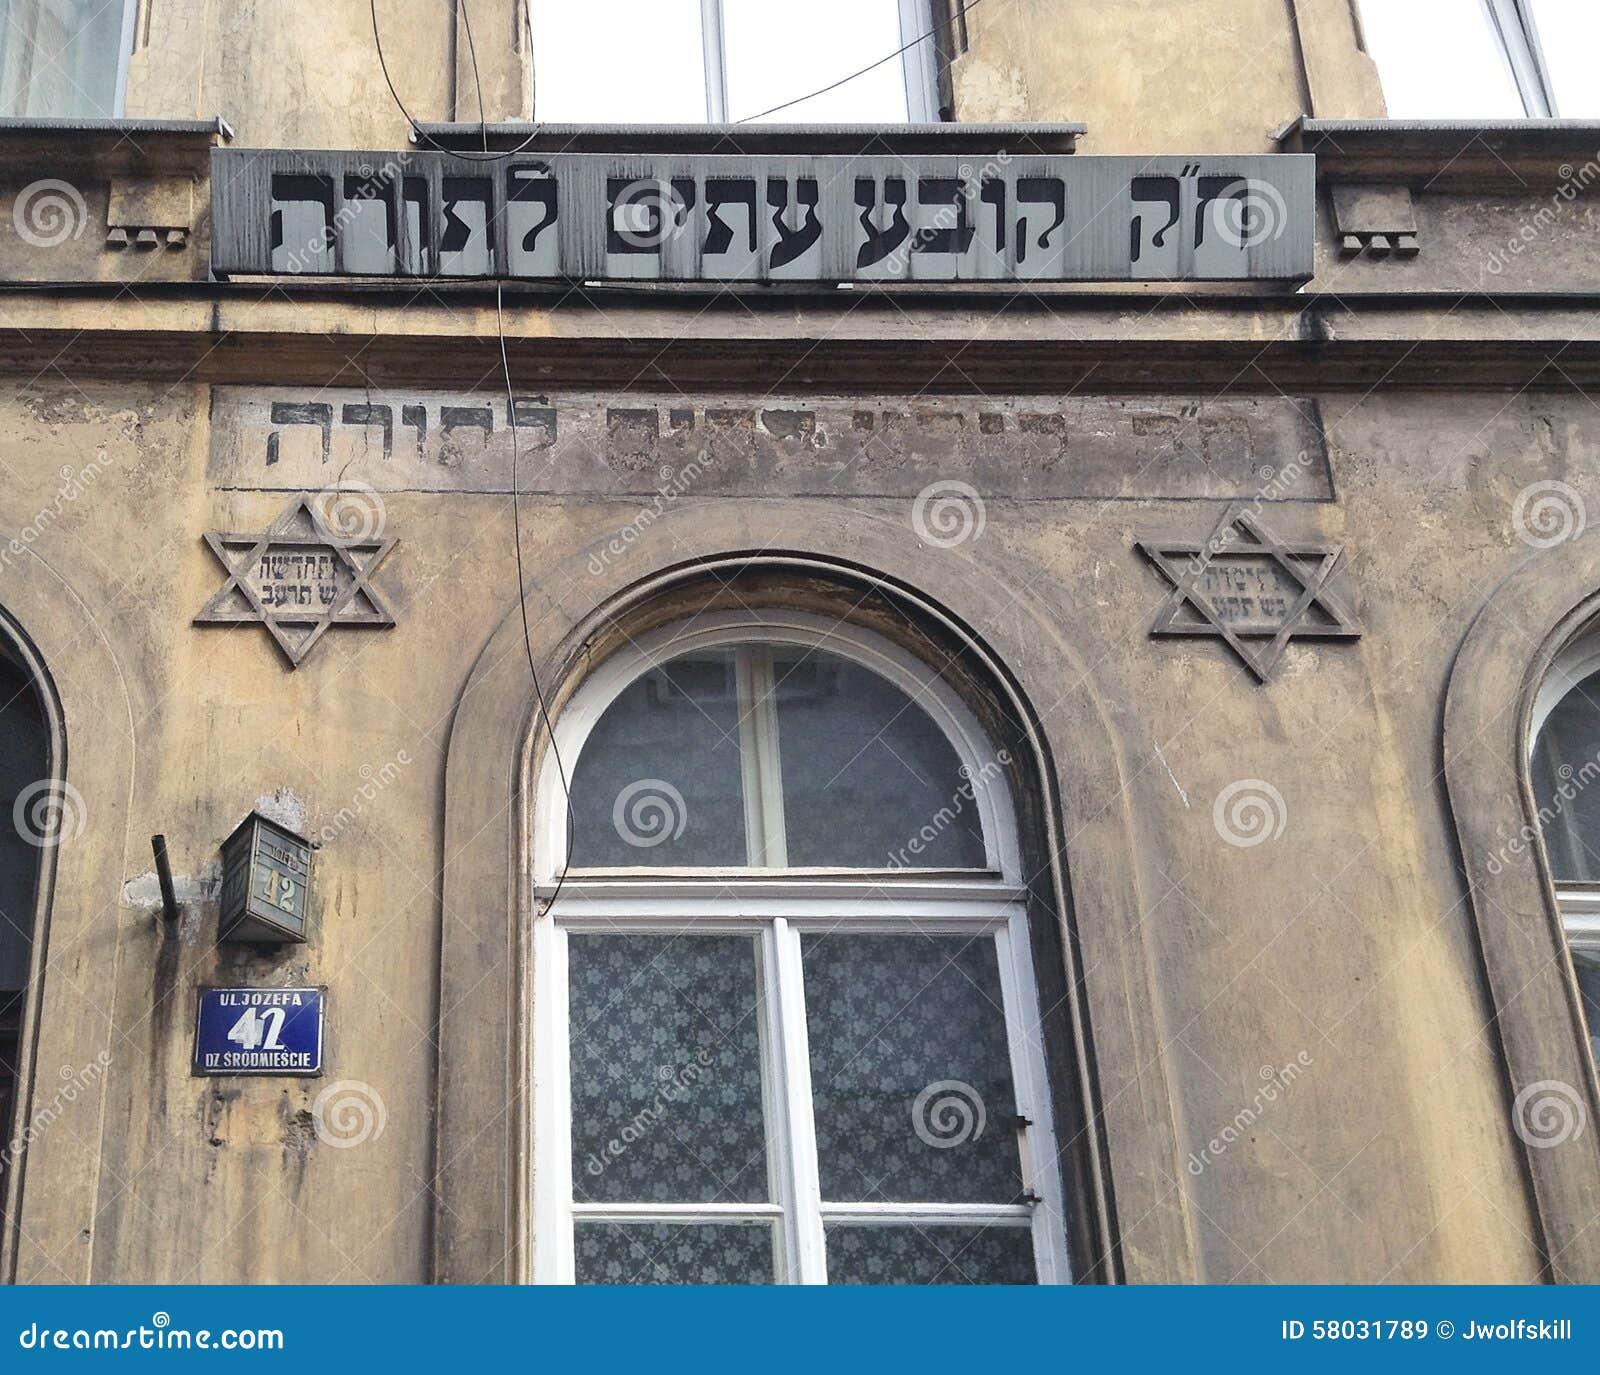 Jewish house of study in kazimierz krakow poland stock for Kosher house